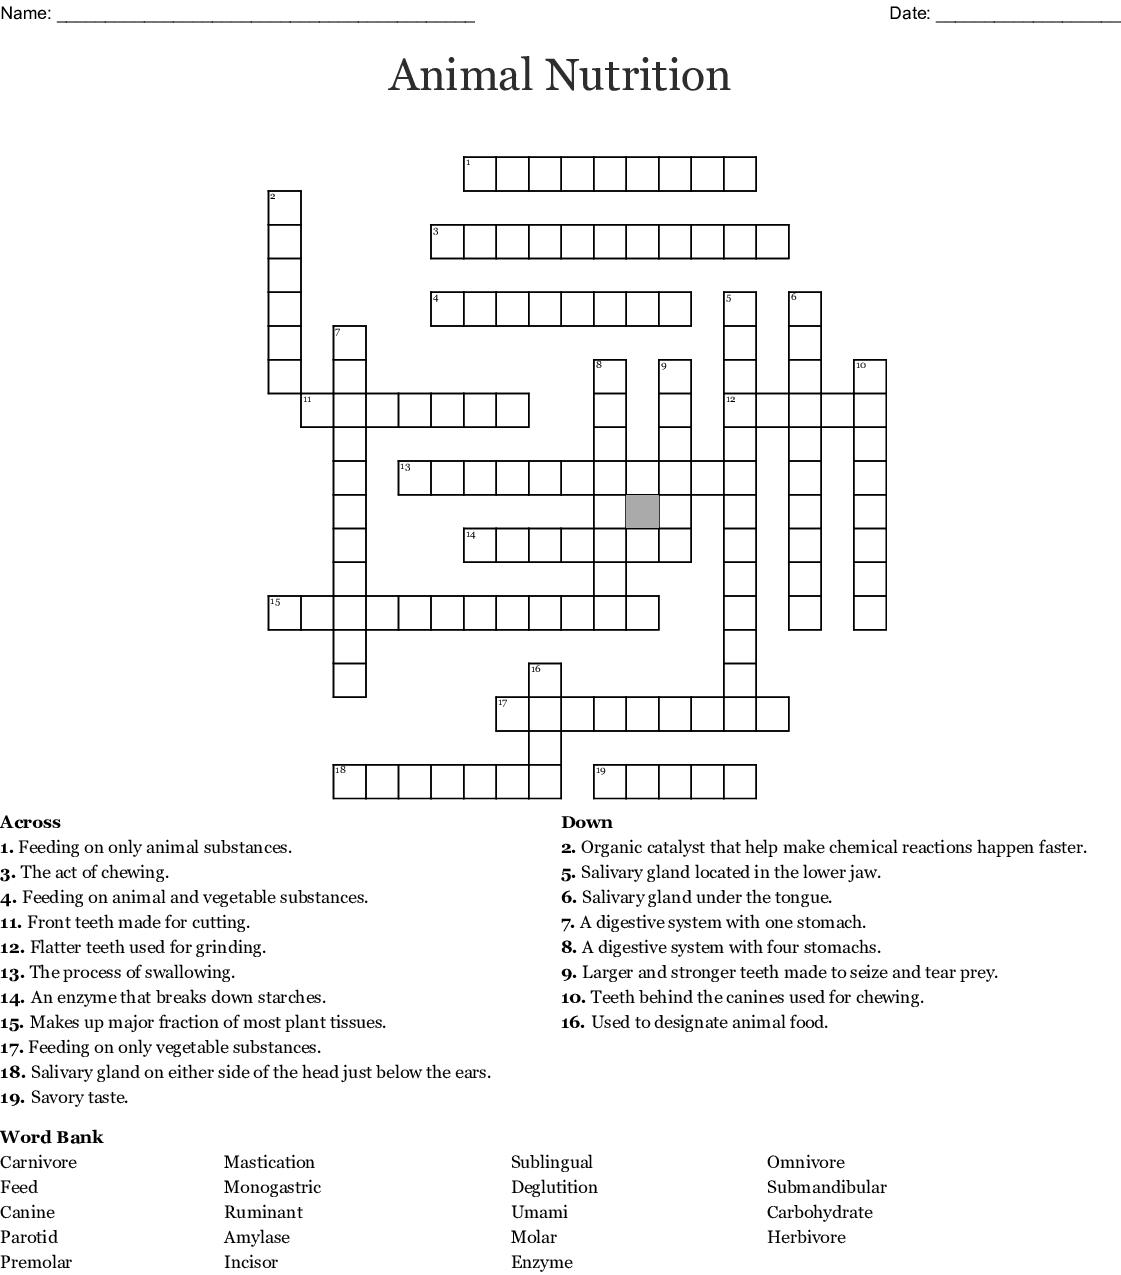 Animal Nutrition Crossword